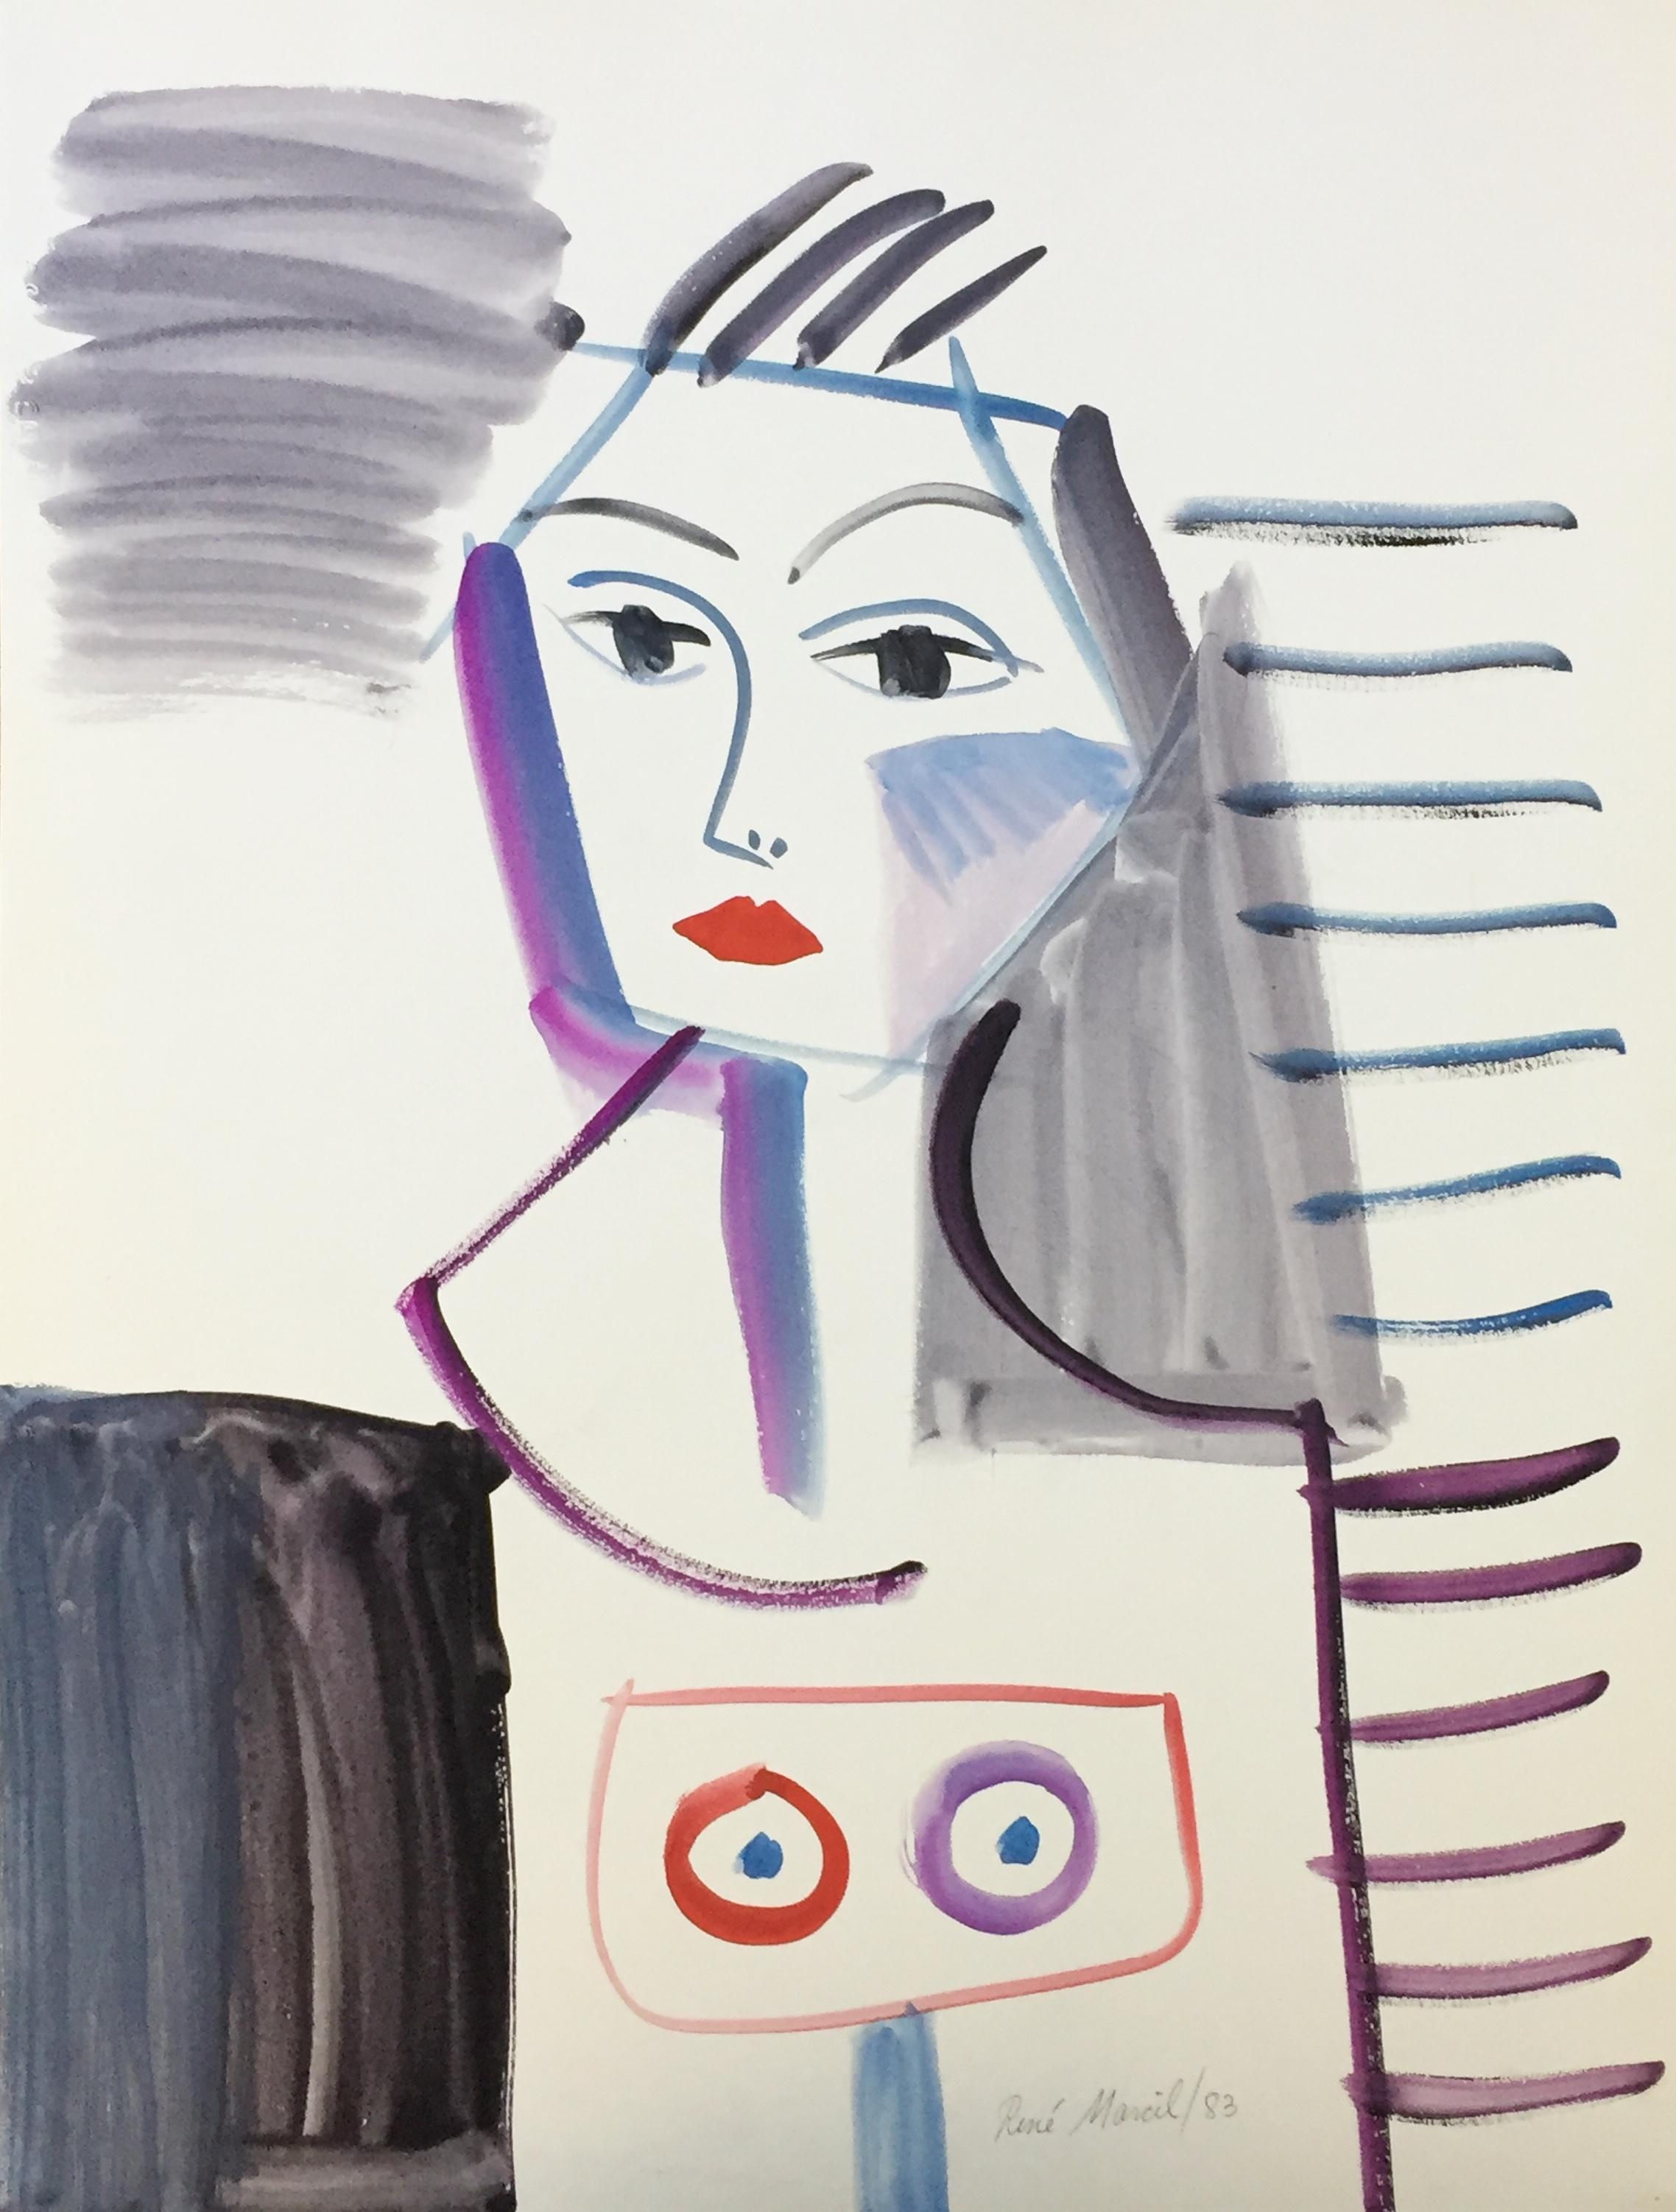 "RenÉ Marcil 'Untitled (woman)' - watercolour on paper198325.5"" x 19.5""unframed"